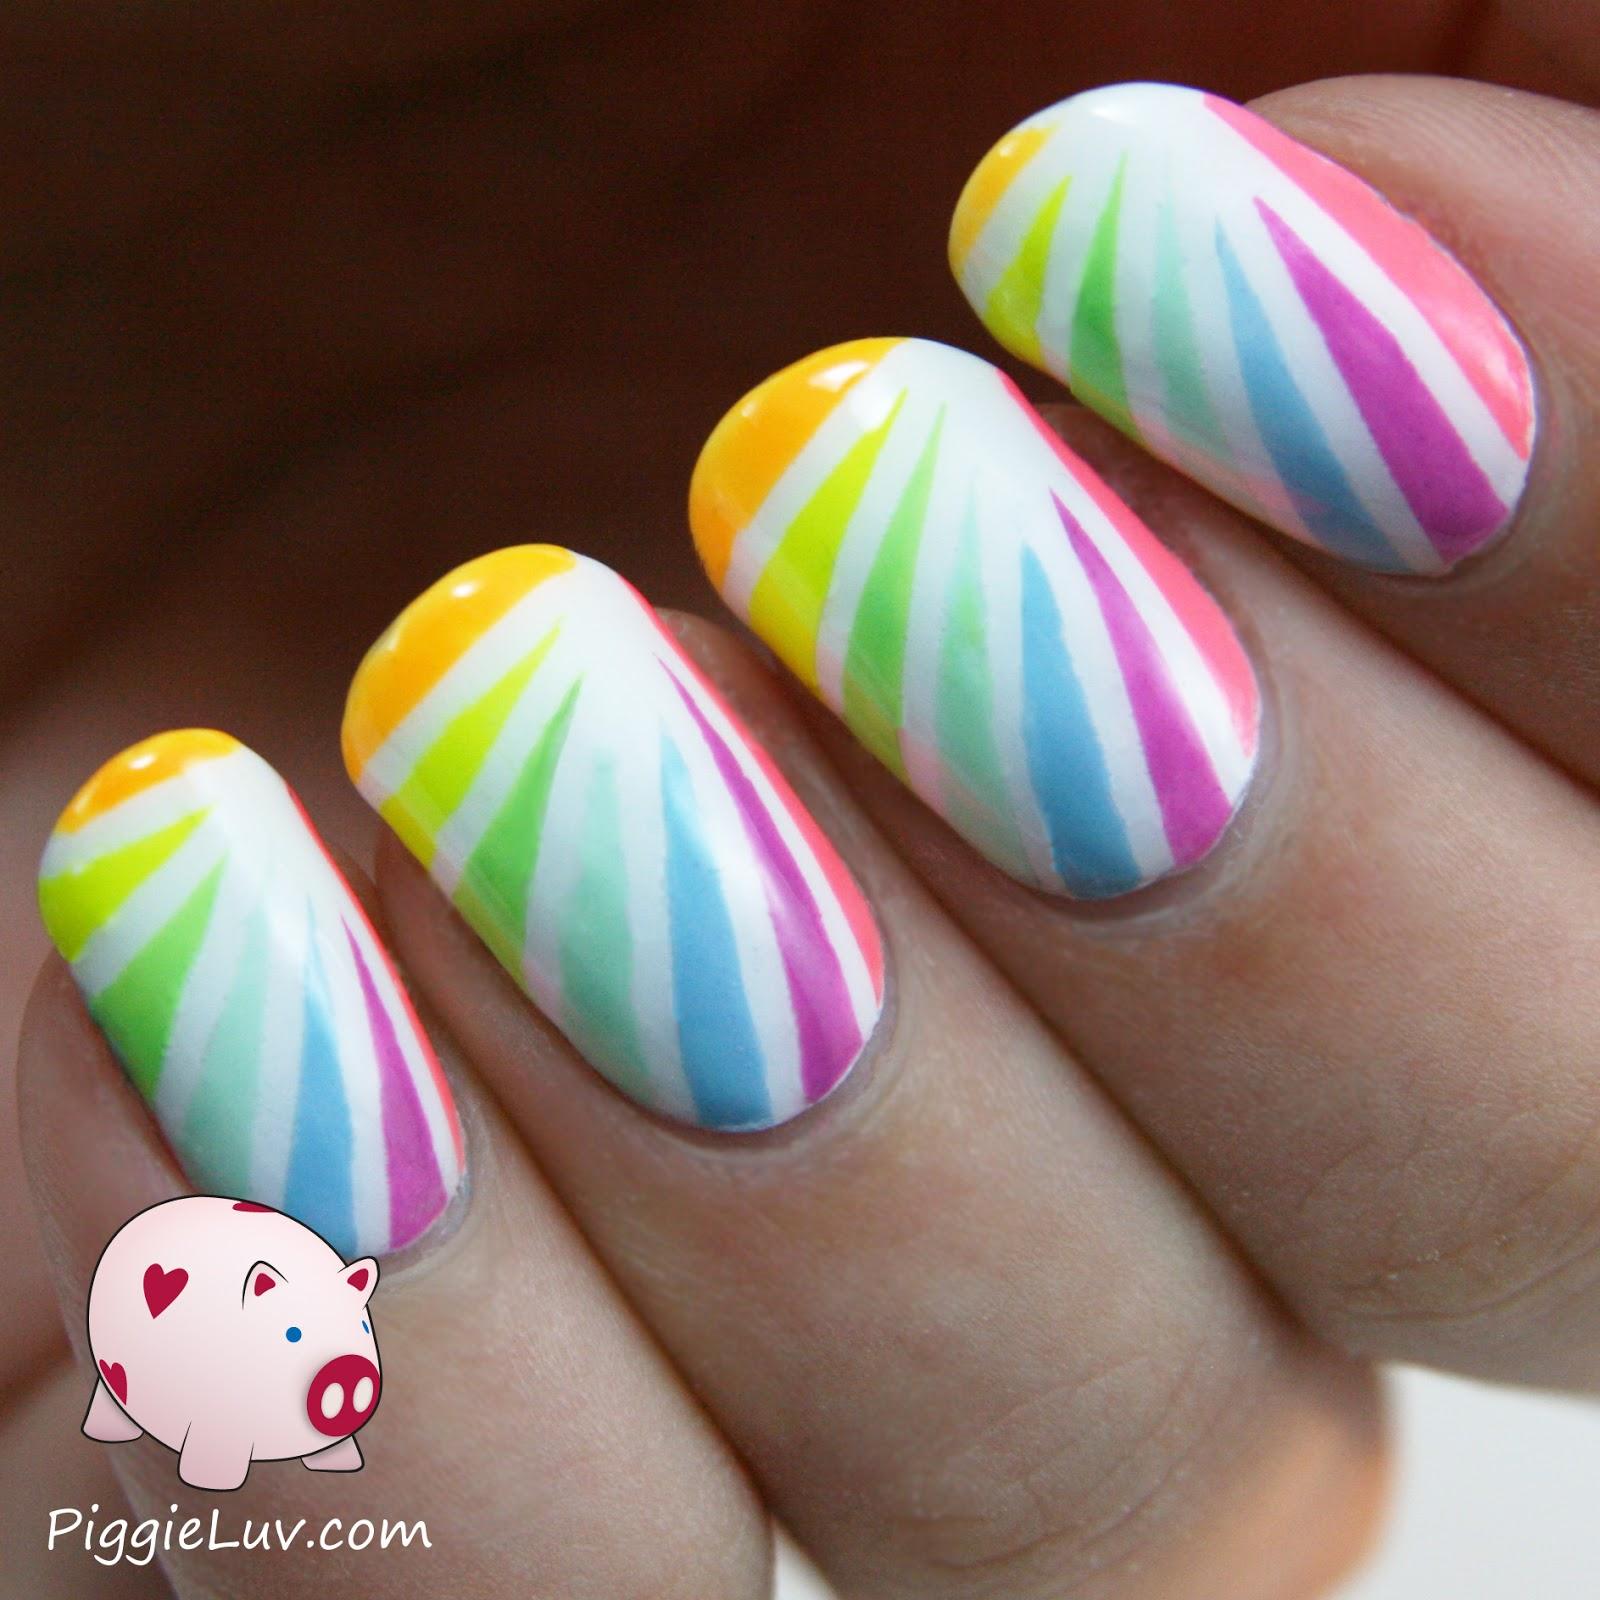 Piggieluv Rainbow Bubbles Nail Art: PiggieLuv: Neon Rainbow Tape Mani